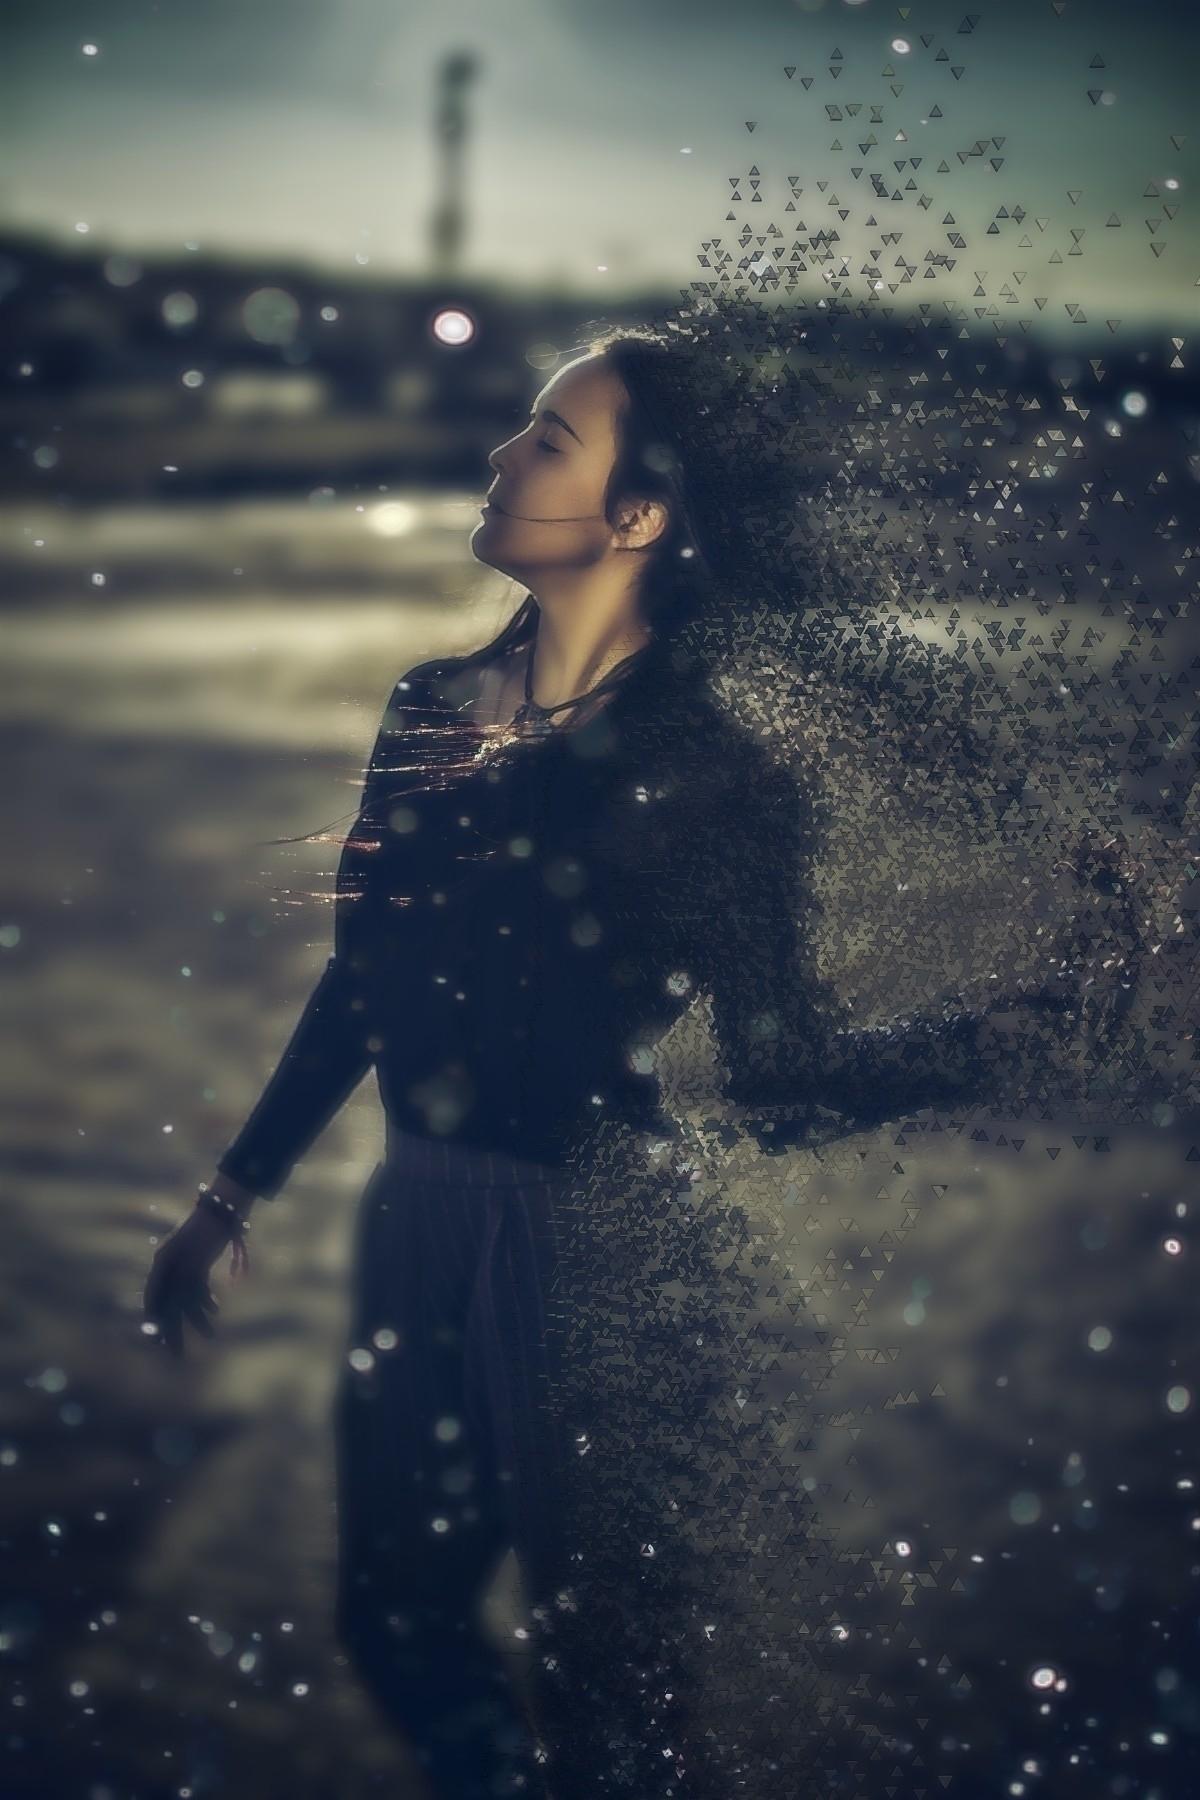 alba:nerd - mujer, girl, portrait - fotografiadl | ello